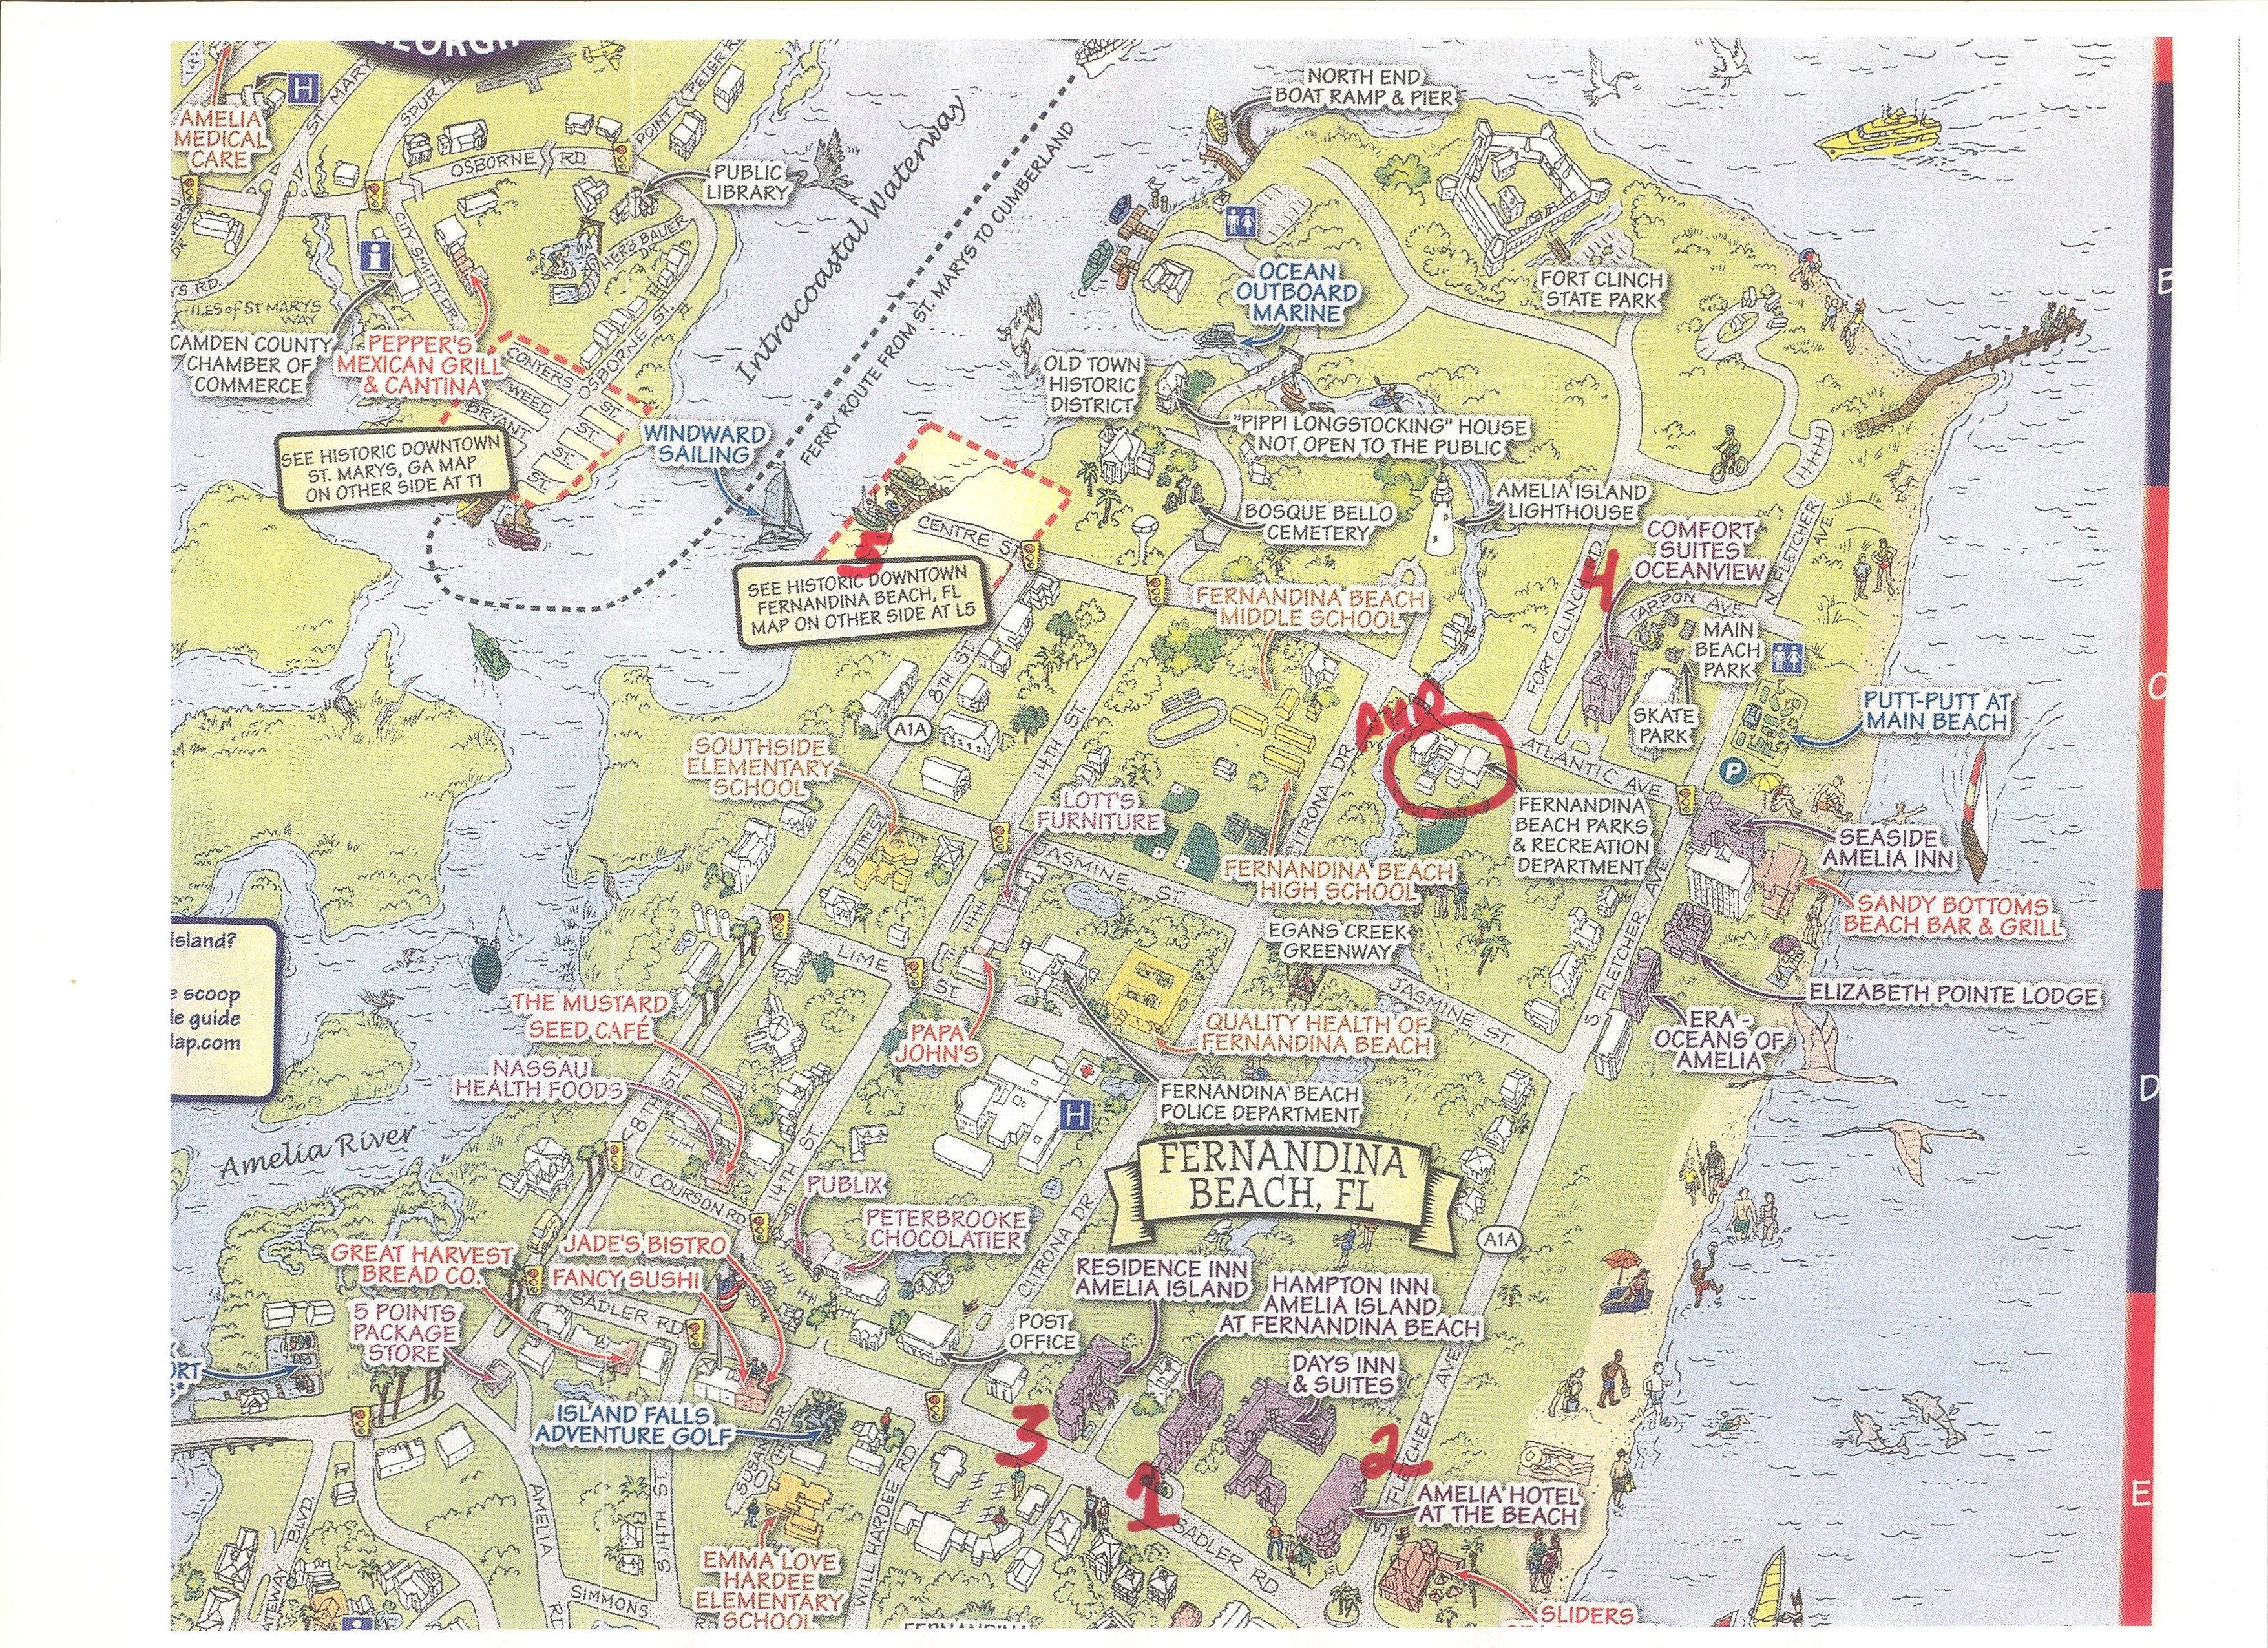 Florida Lighthouse Association, Inc. - Amelia Island - January 2014 - Amelia Island Florida Map